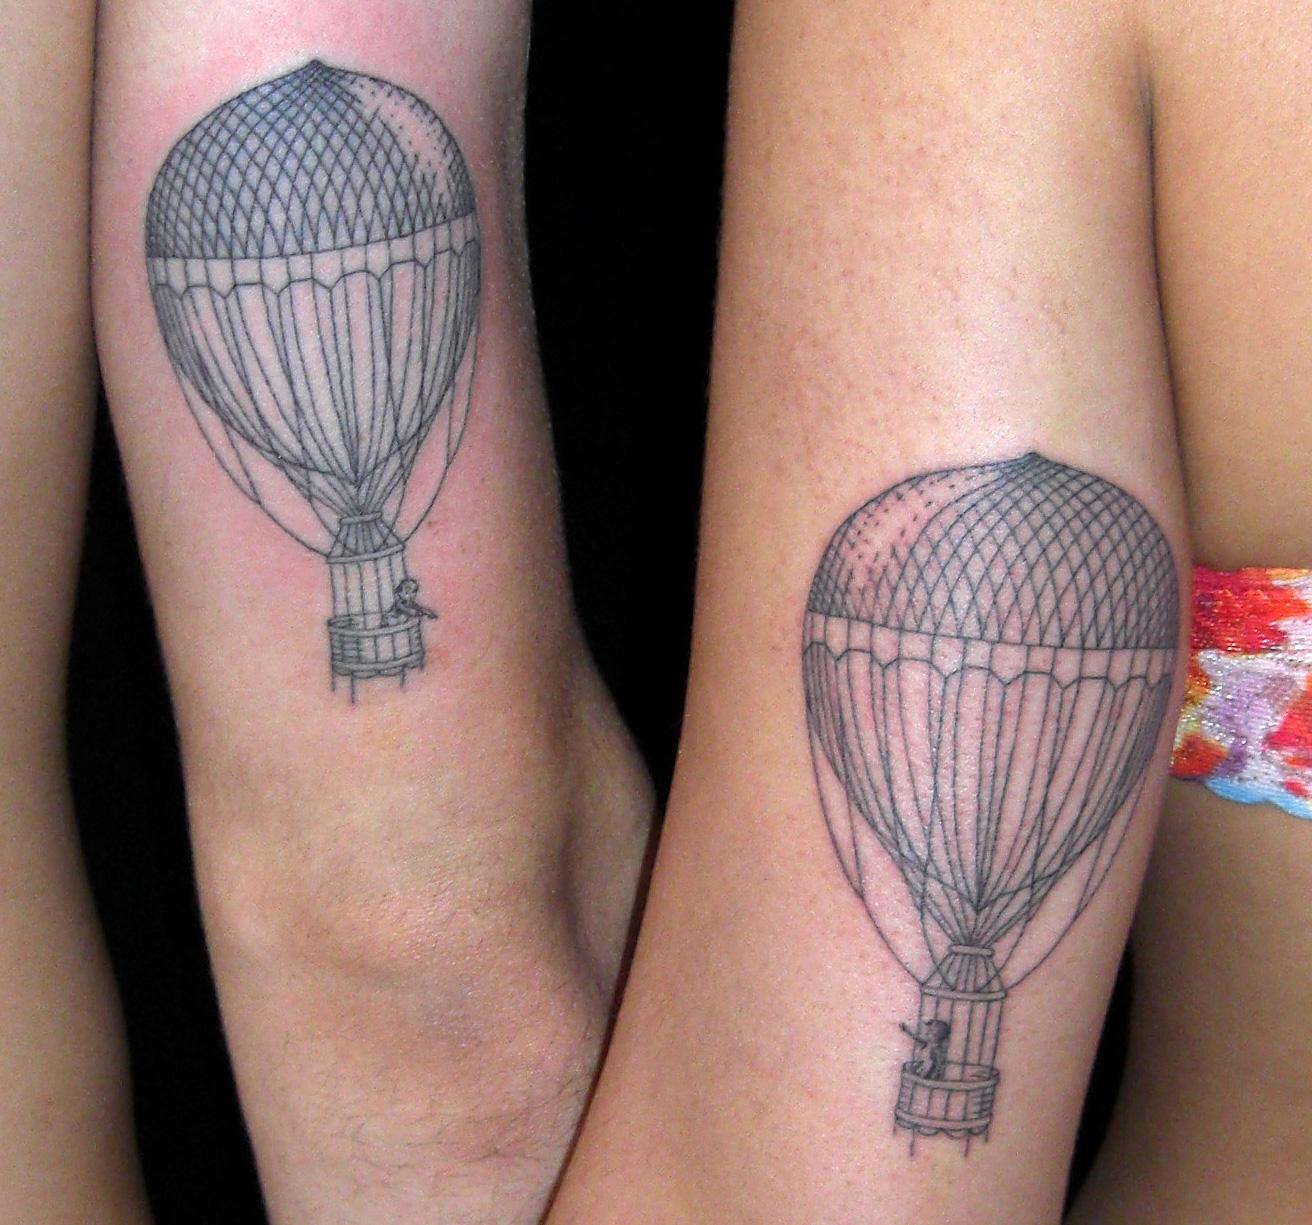 balloons_edit